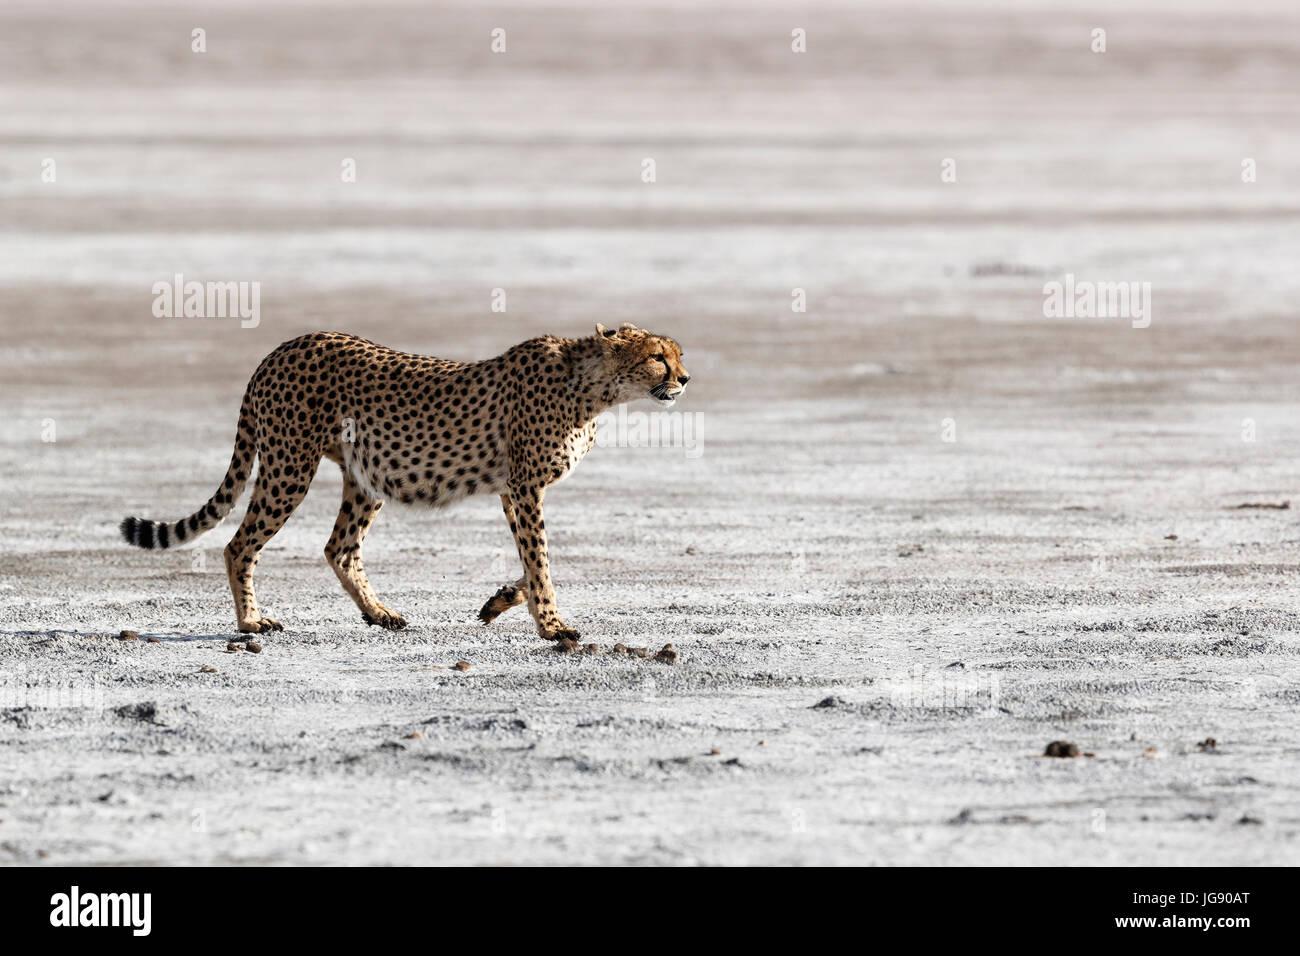 A cheetah (Acinonyx jubatus) walks across a dry river bed  in the Serengeti Tanzania Stock Photo